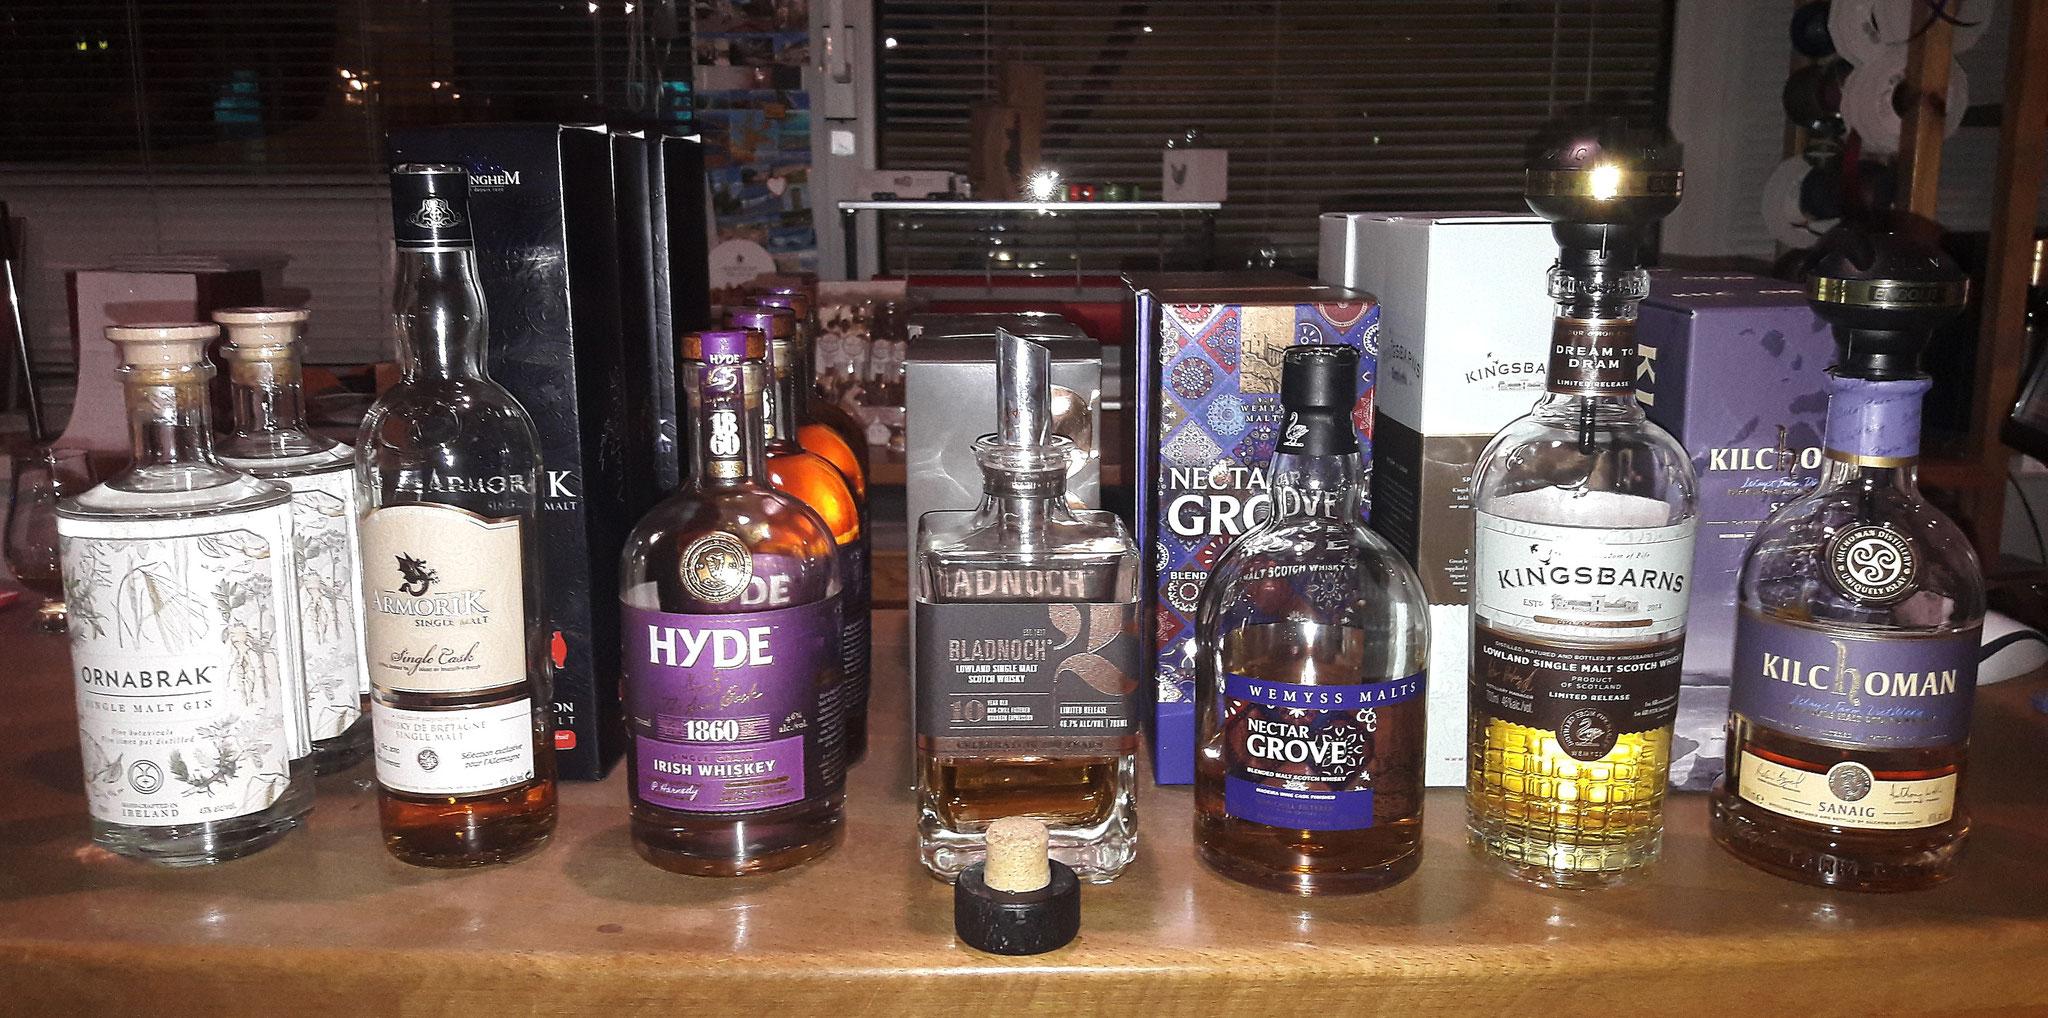 Whiskyauswahl ARMORIK, HYDE, BLADNOCH, WEMYSS, KINGSBARNS, KILCHOMAN